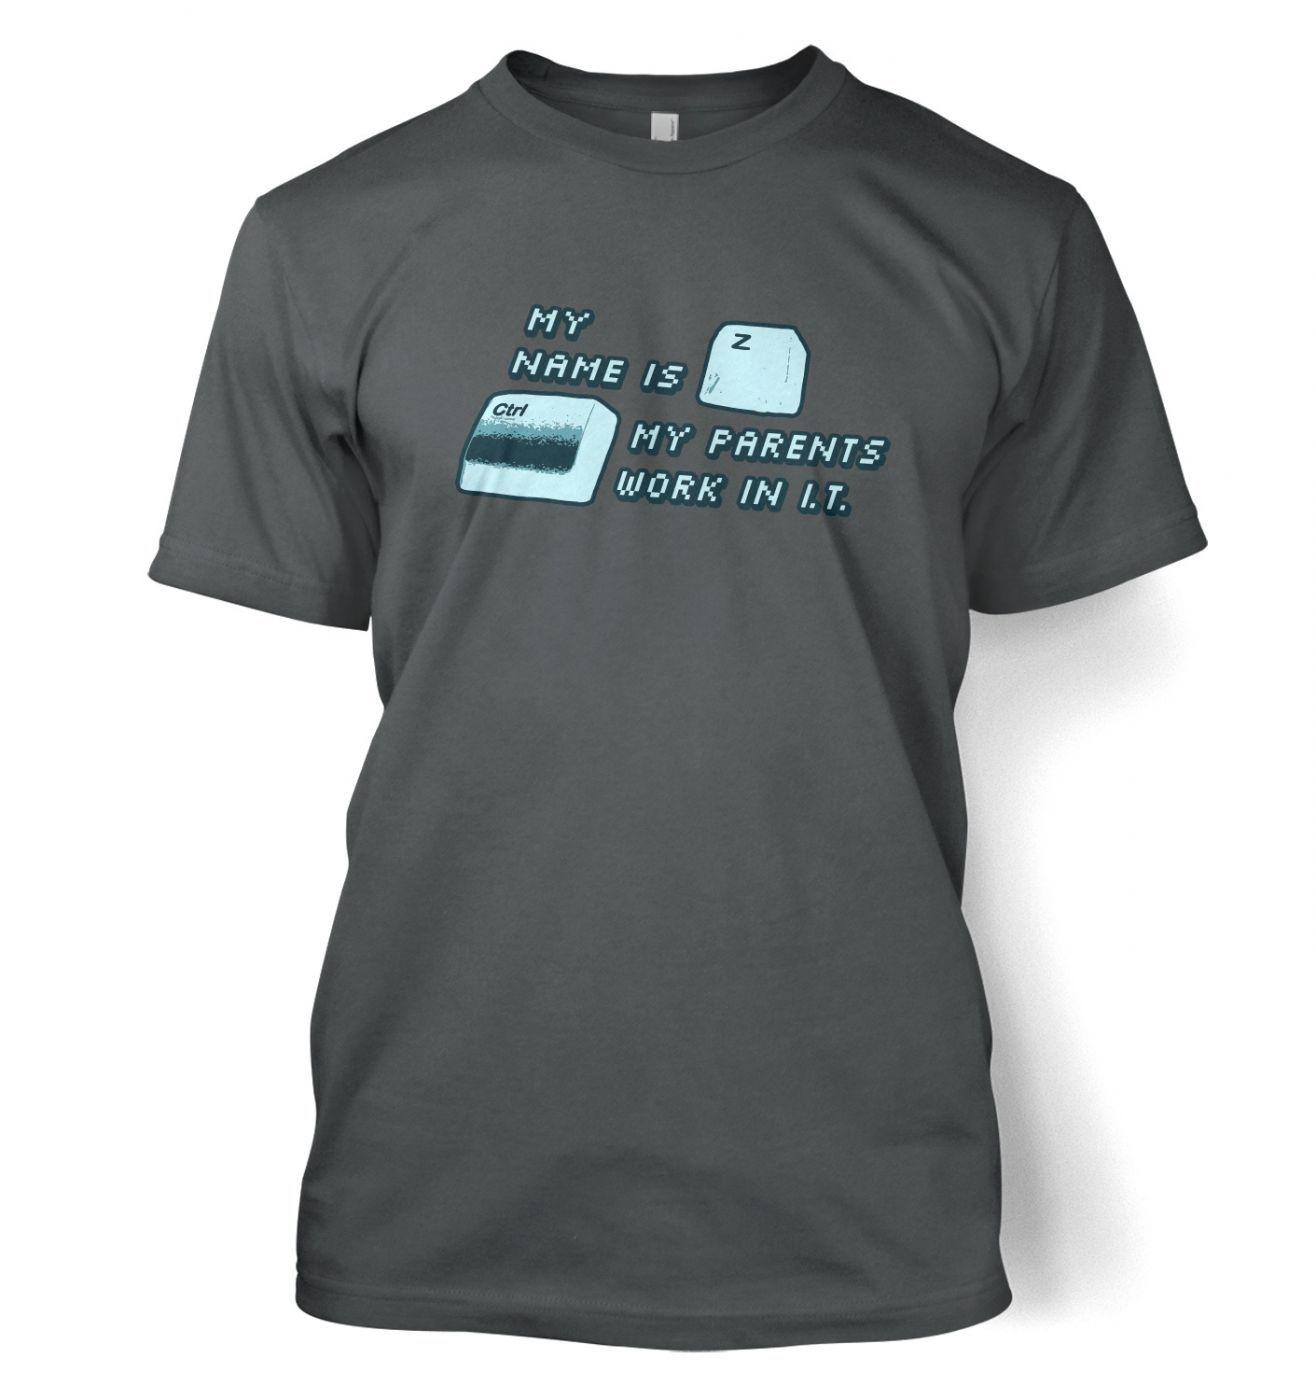 My Name Is Ctrl-Z men's t-shirt